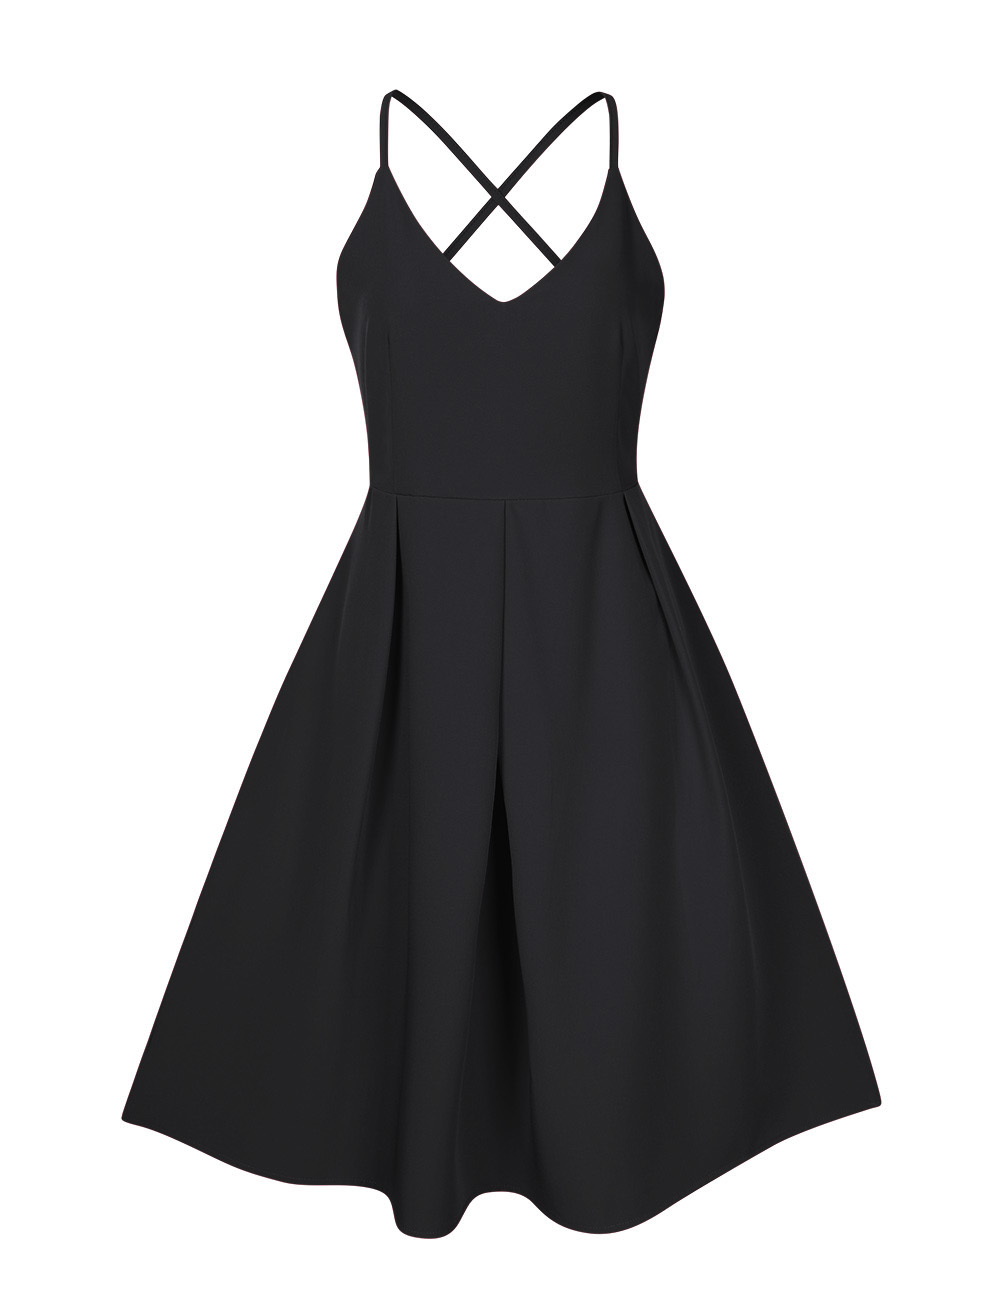 GlorySunshine Women Deep V-Neck Spaghetti Strap Dress Sleeveless Sexy Summer Cocktail Party Dresses Black_M